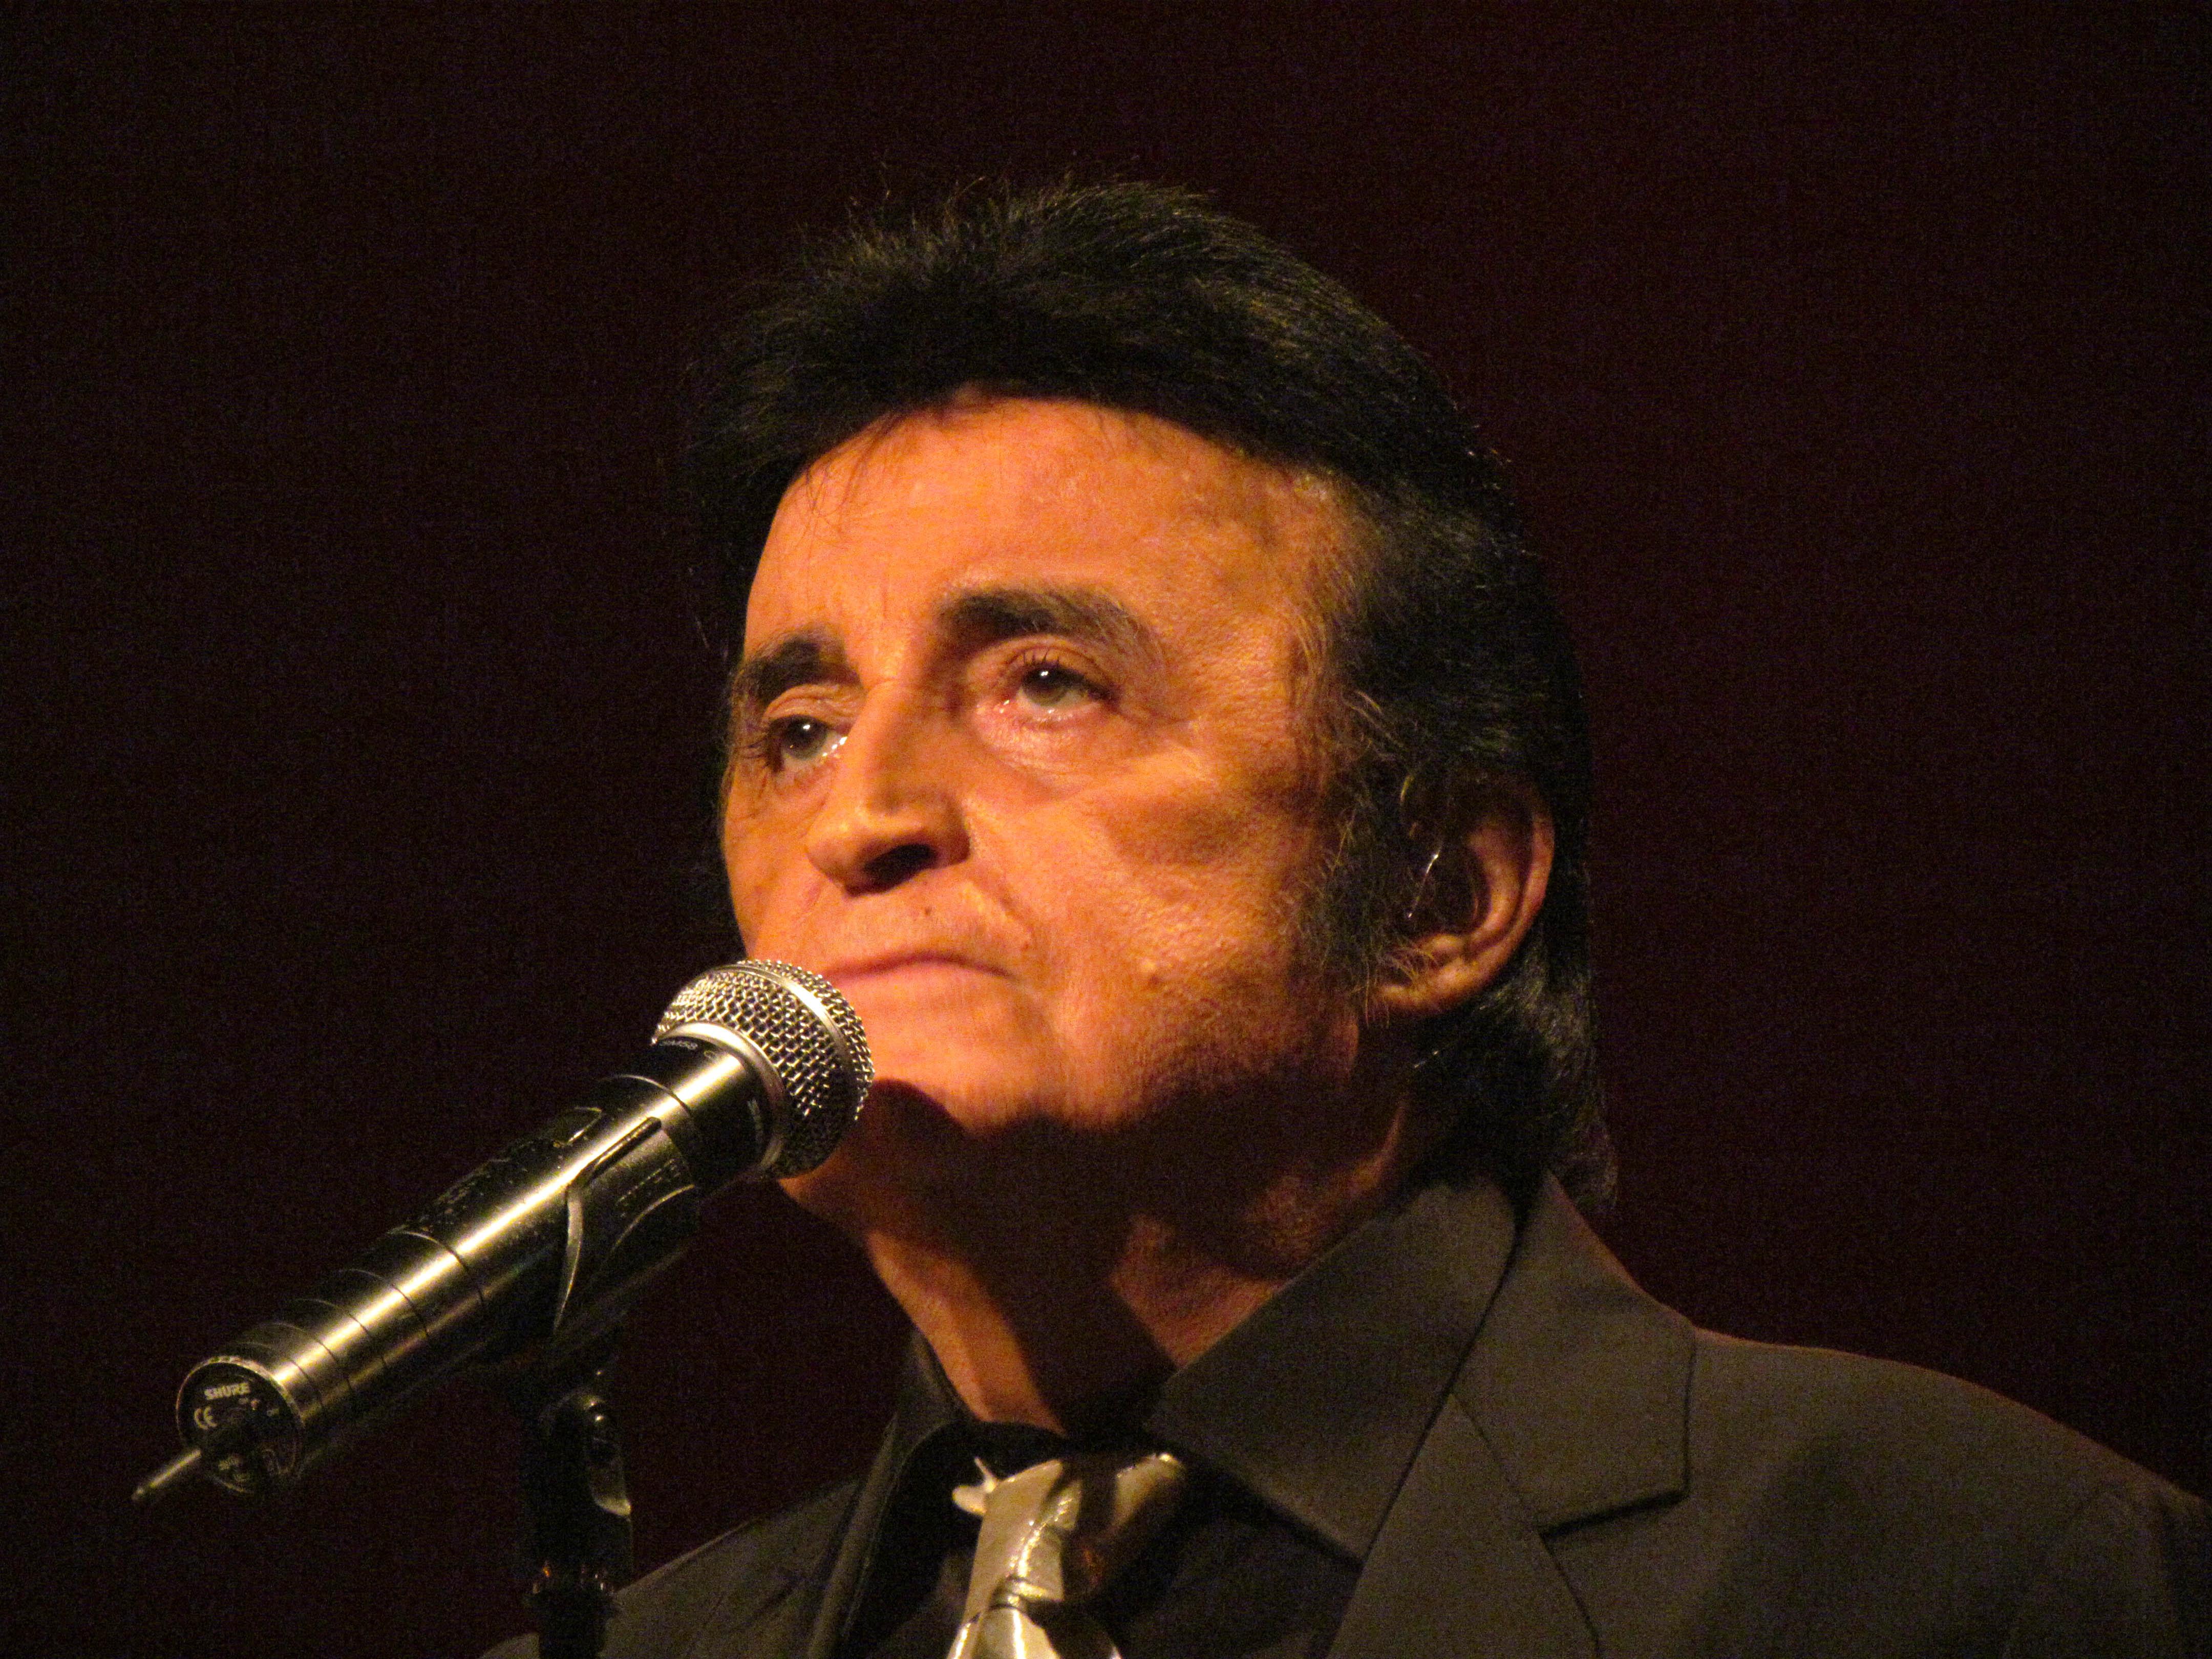 File:Dick Rivers sur scène le 24 mars 2012.jpg - Wikimedia Commons